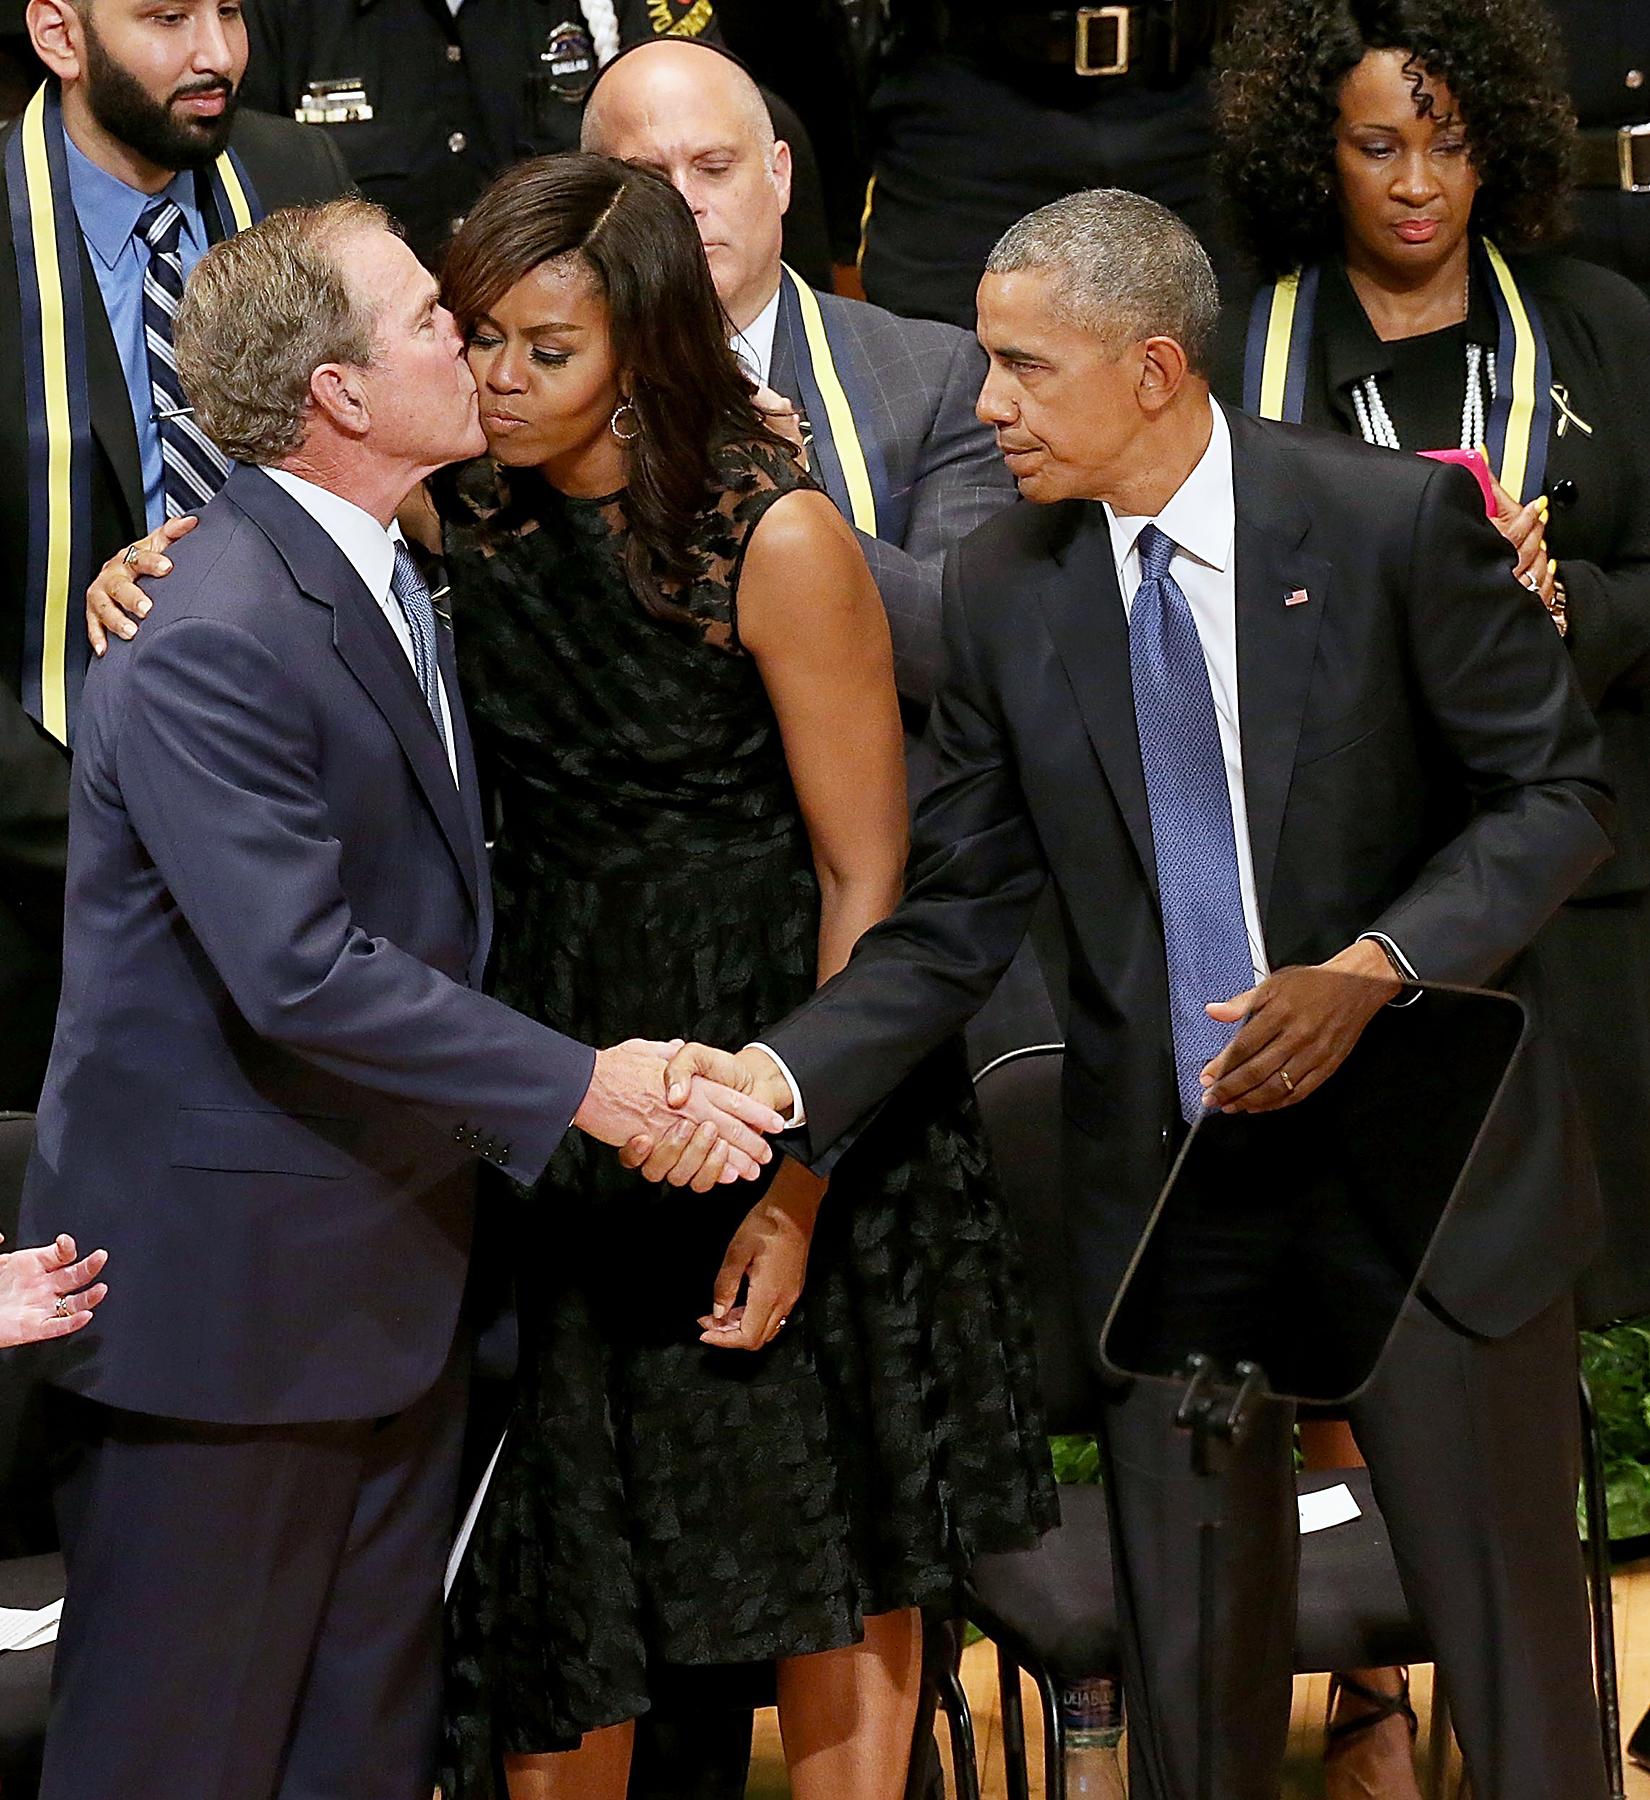 George Bush Michelle Obama Barack Obama Dallas shooting memorial